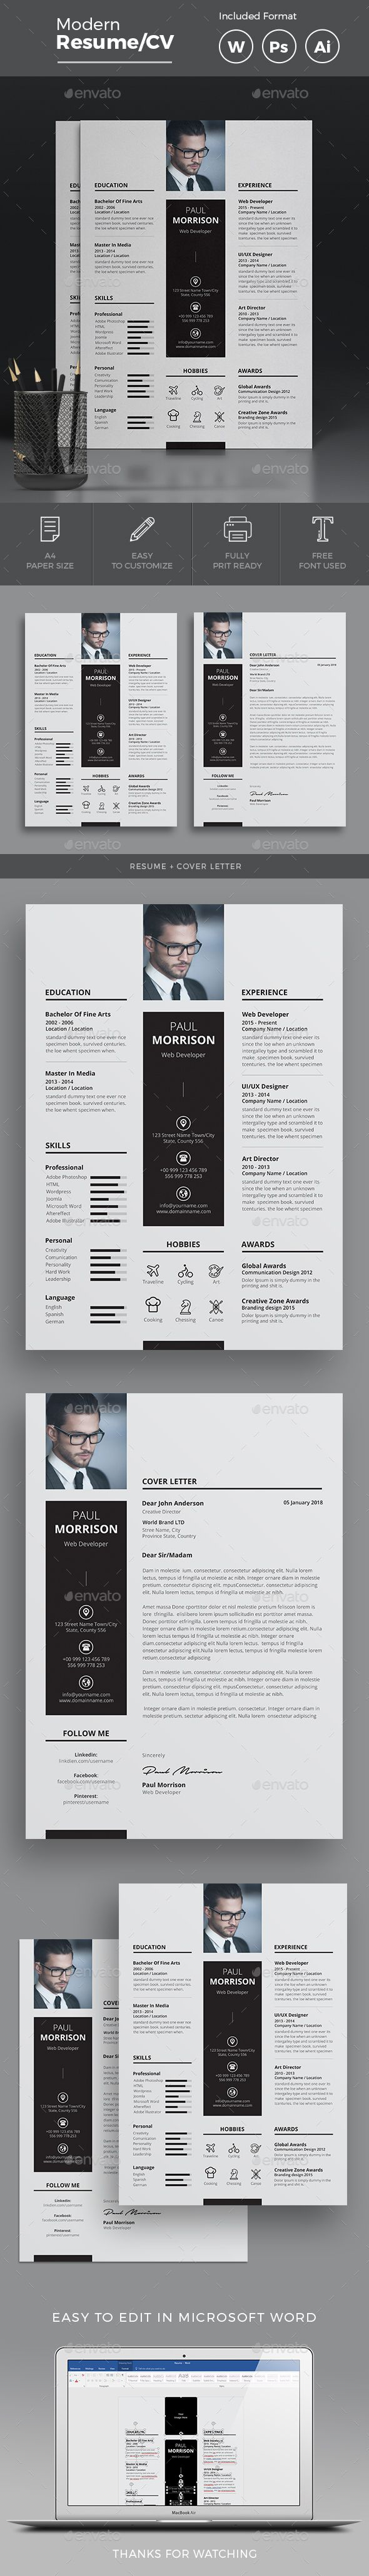 fashion merchandising resume%0A Resume